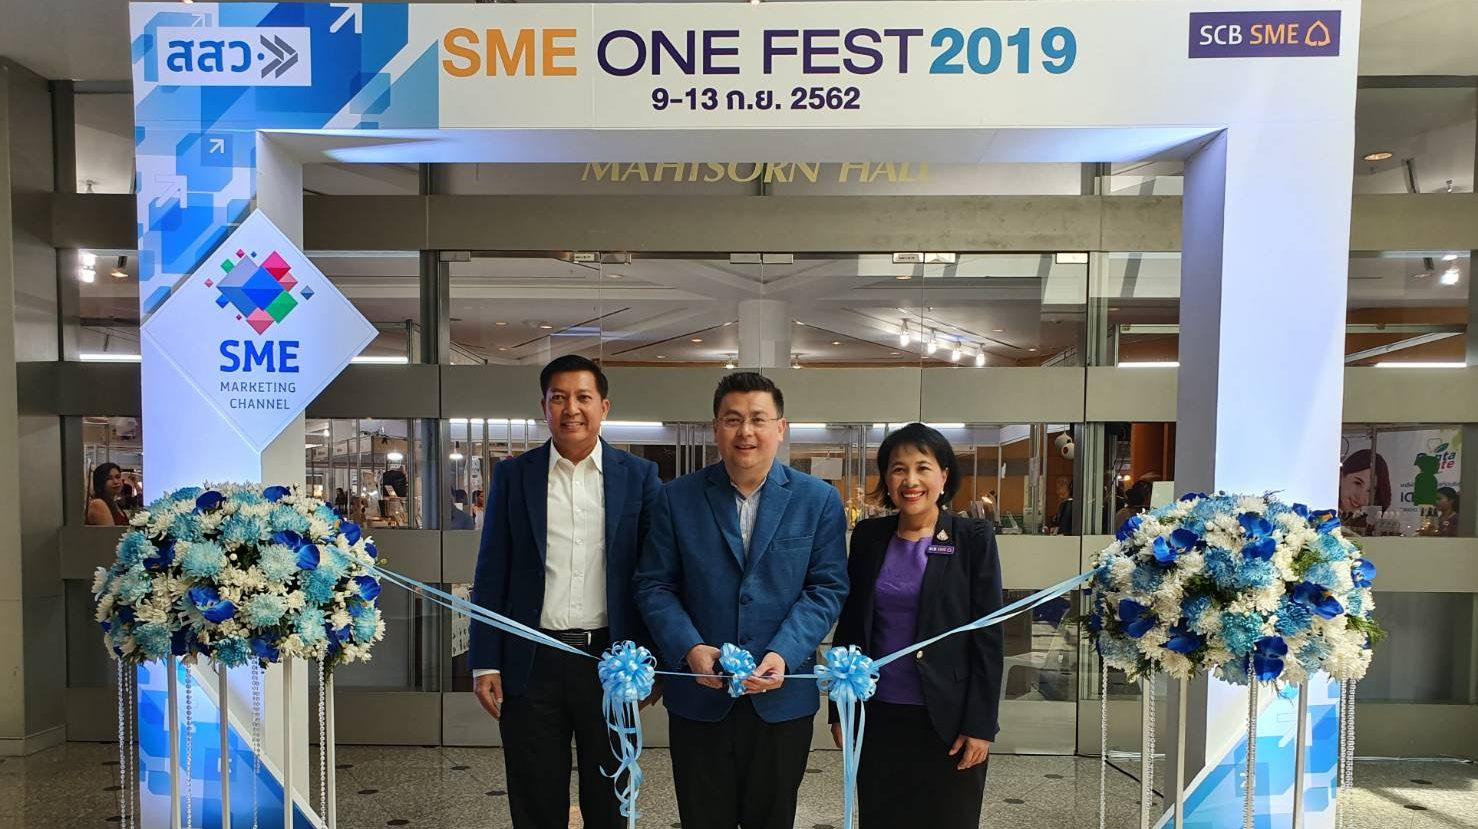 SME ONE FEST 2019 สสว.